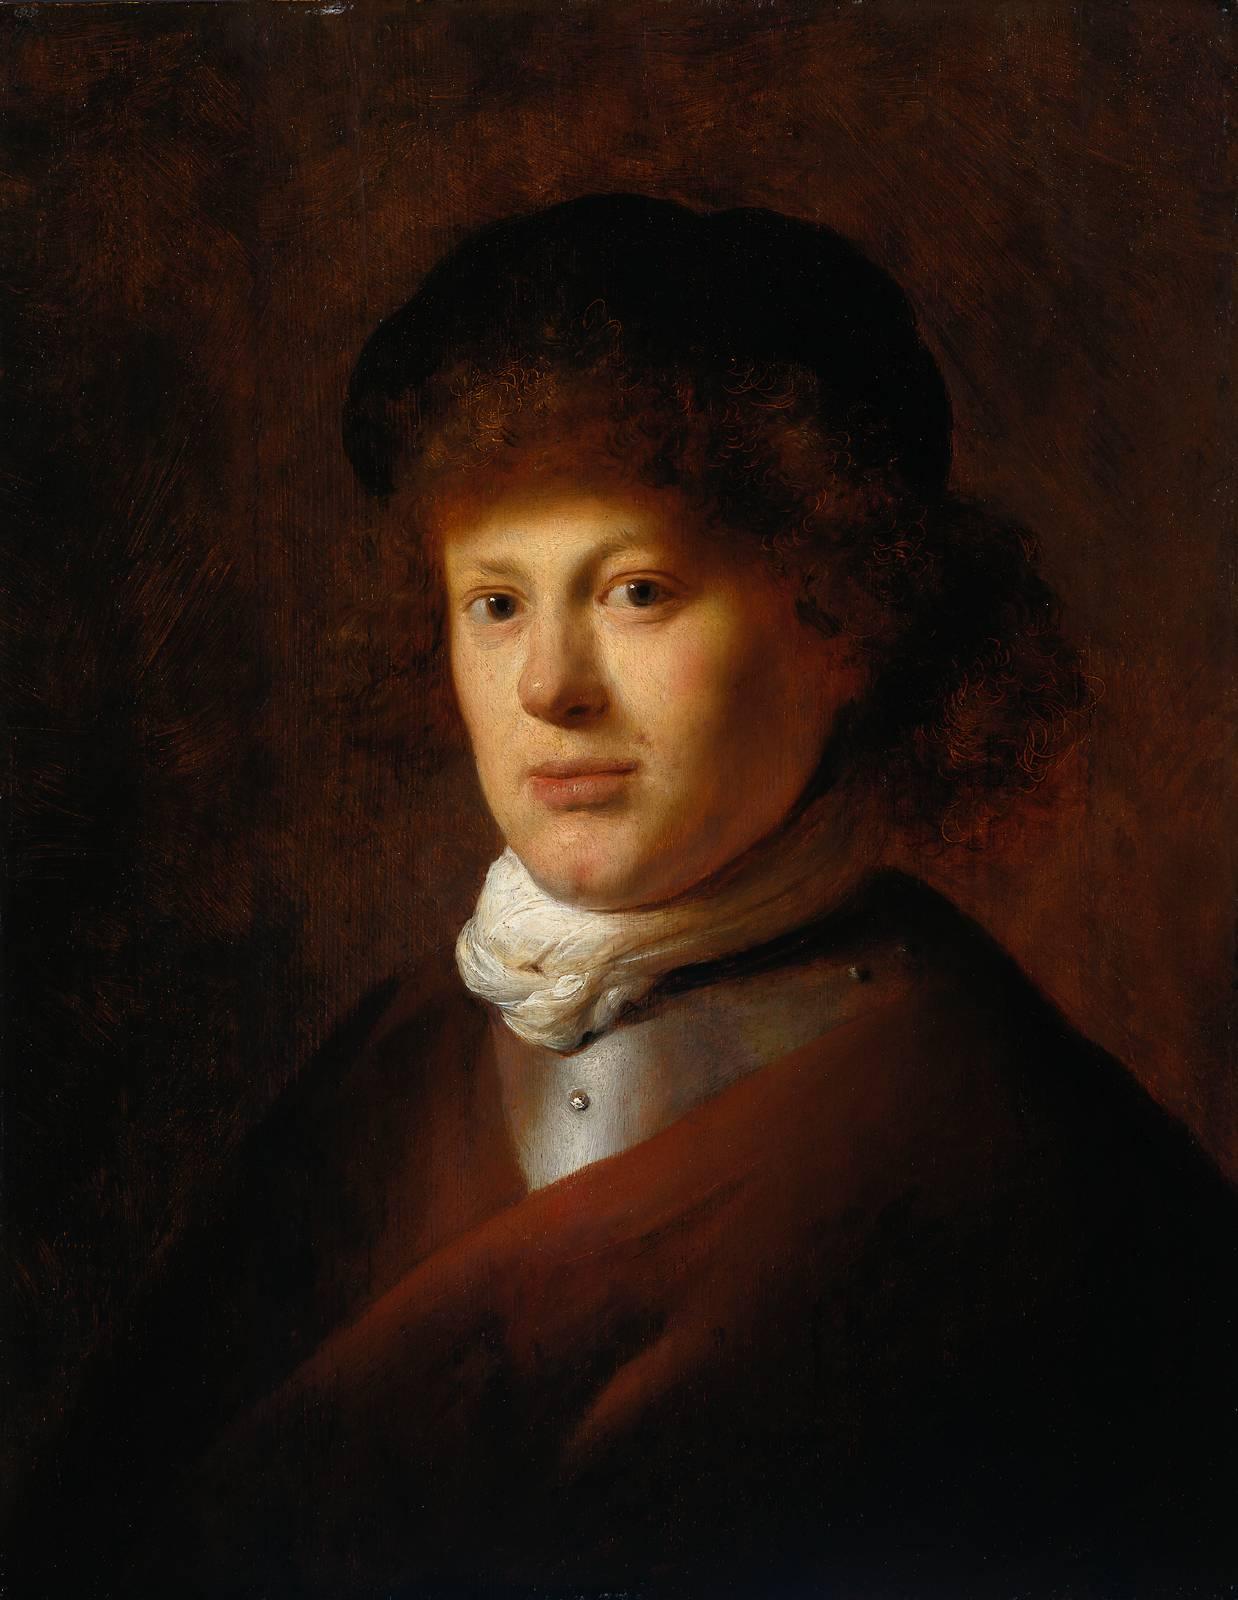 Rembrandt Van Rijn Self Portrait 1629 Portrait of Rembrandt ...